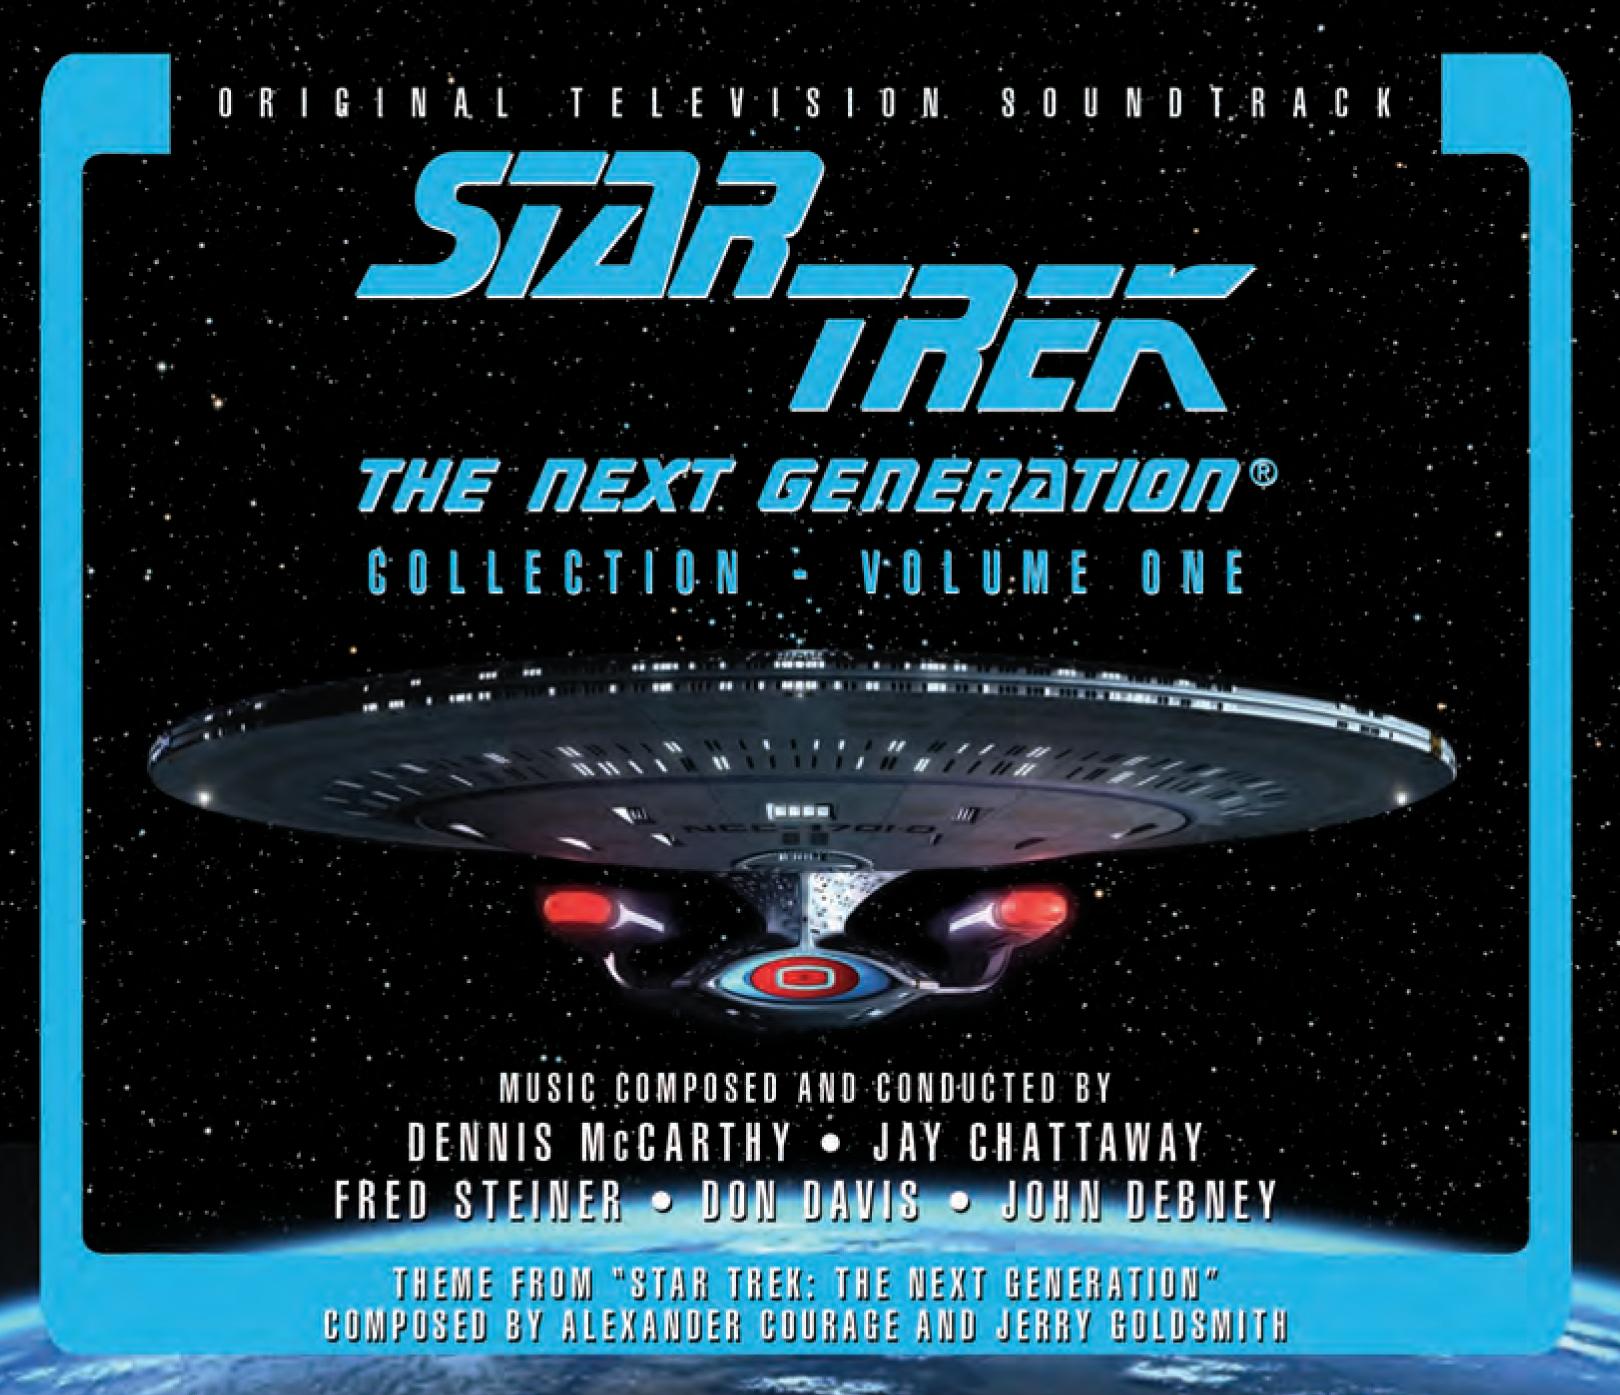 Star Trek: The Next Generation Collection – Volume One